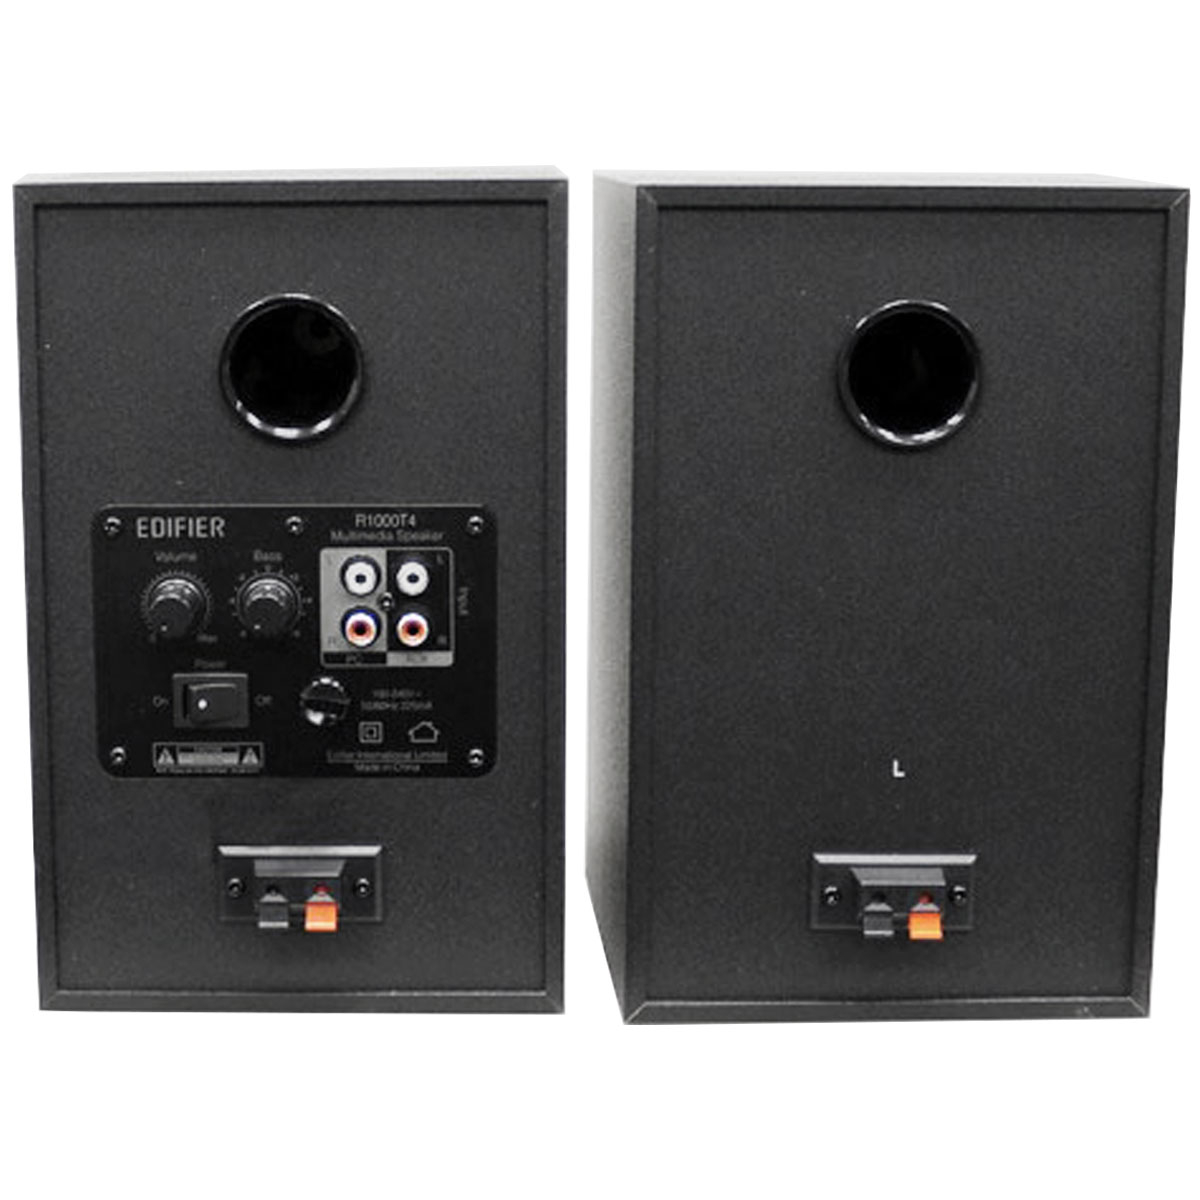 Monitor de Referência Ativo Fal 4 Pol 24W (Par) - R 1000 T 4 Edifier